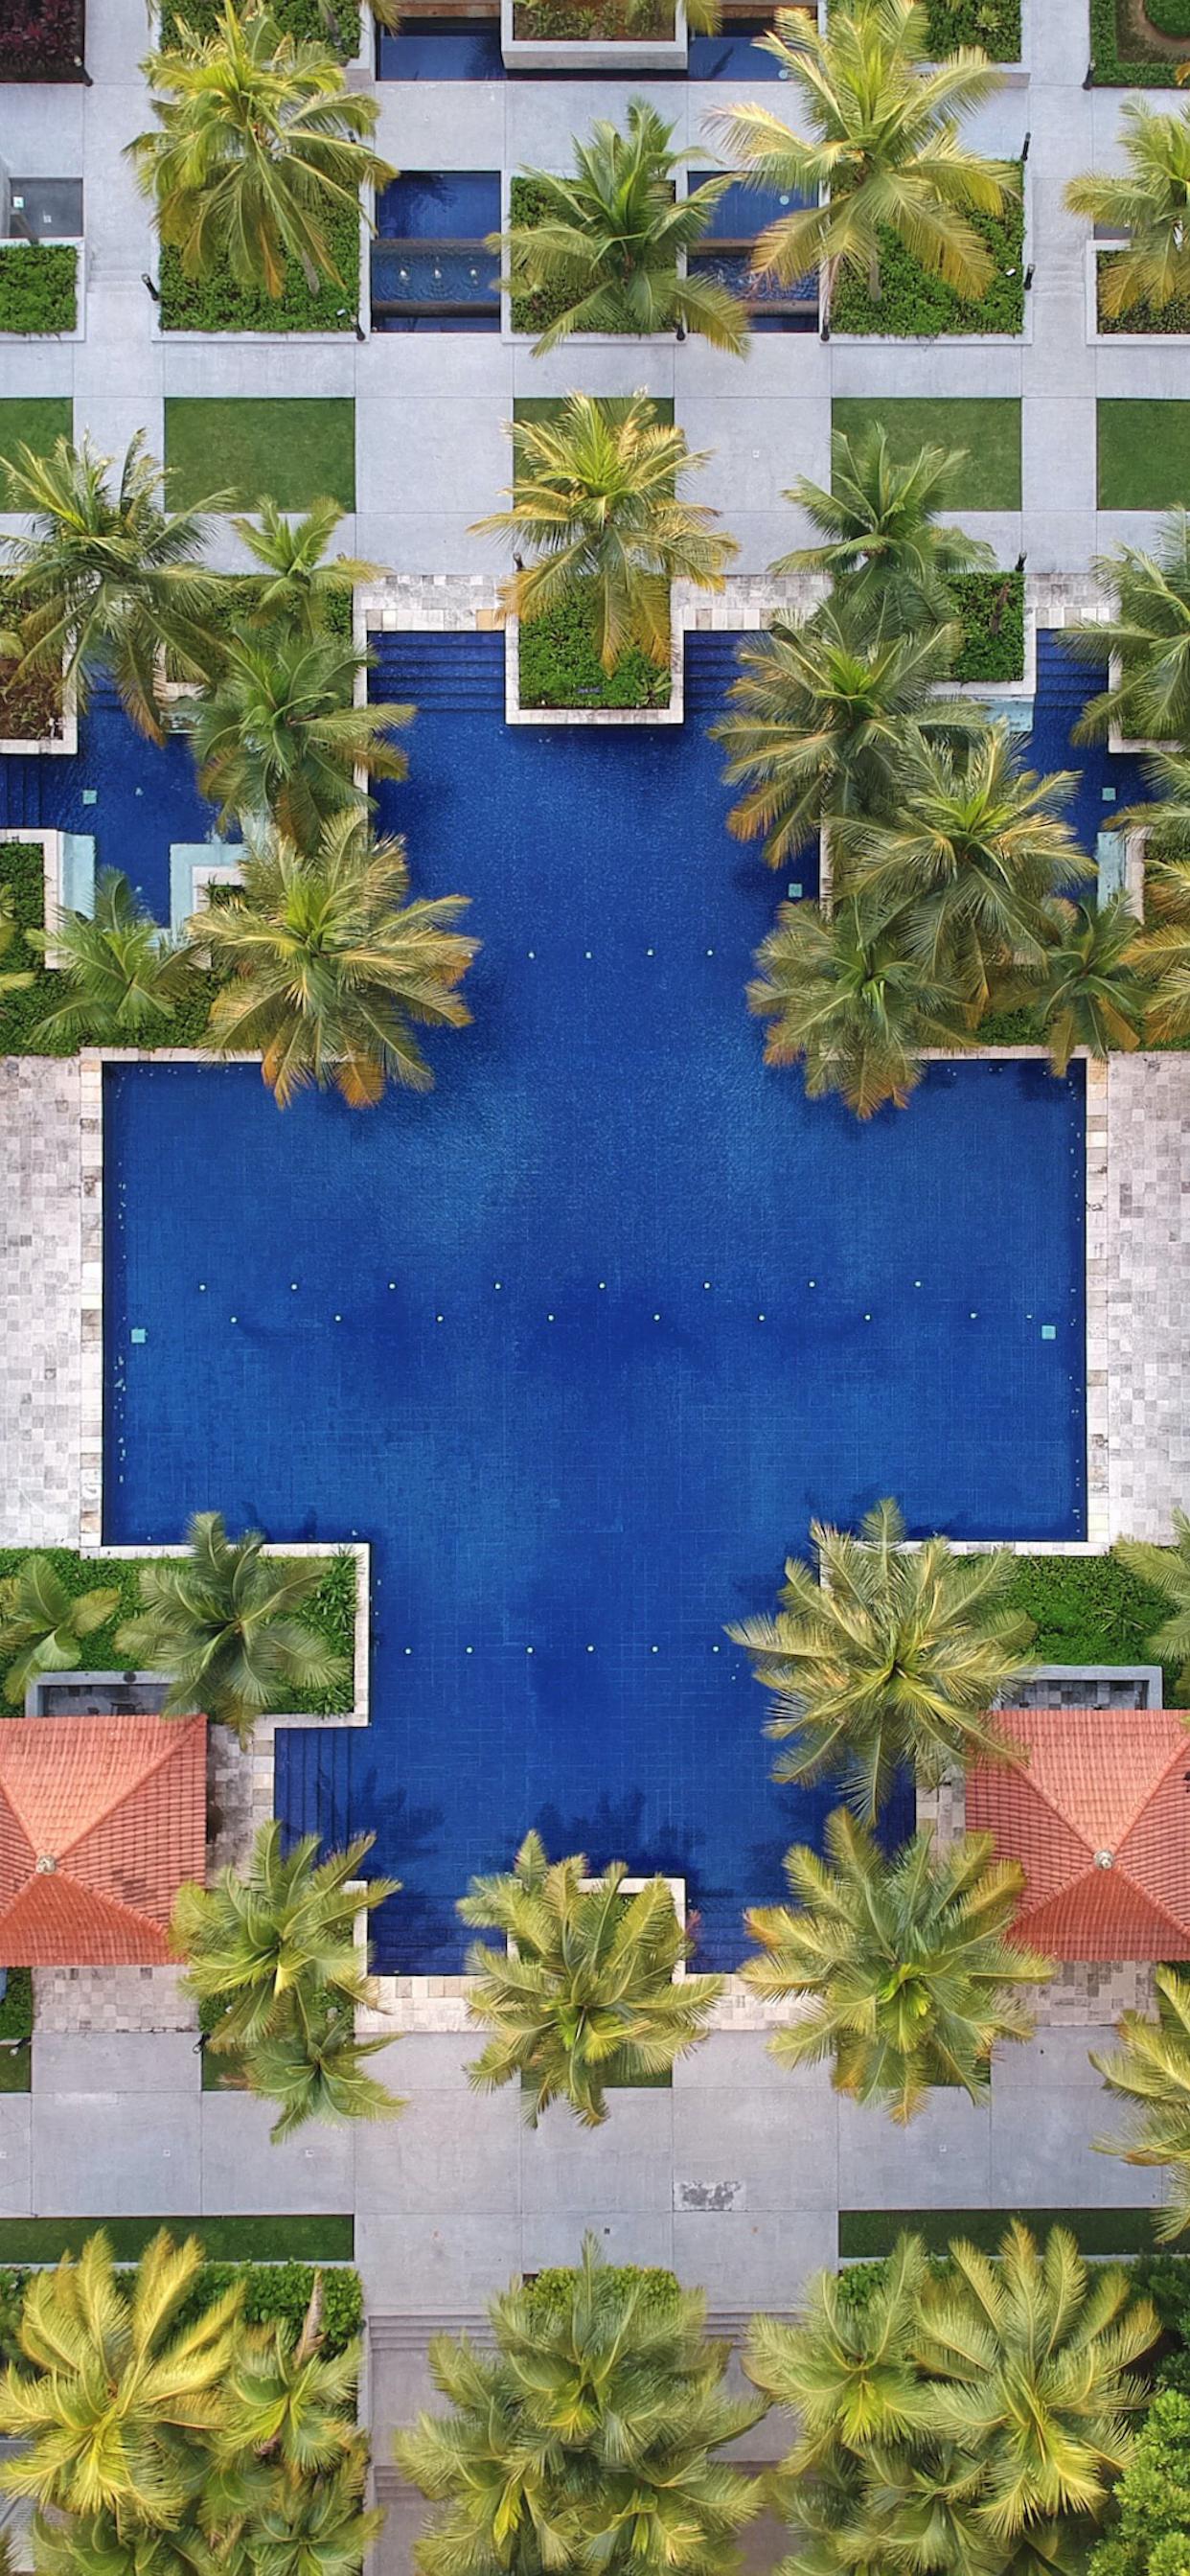 iPhone wallpapers pool petaling jaya malaysia Pool